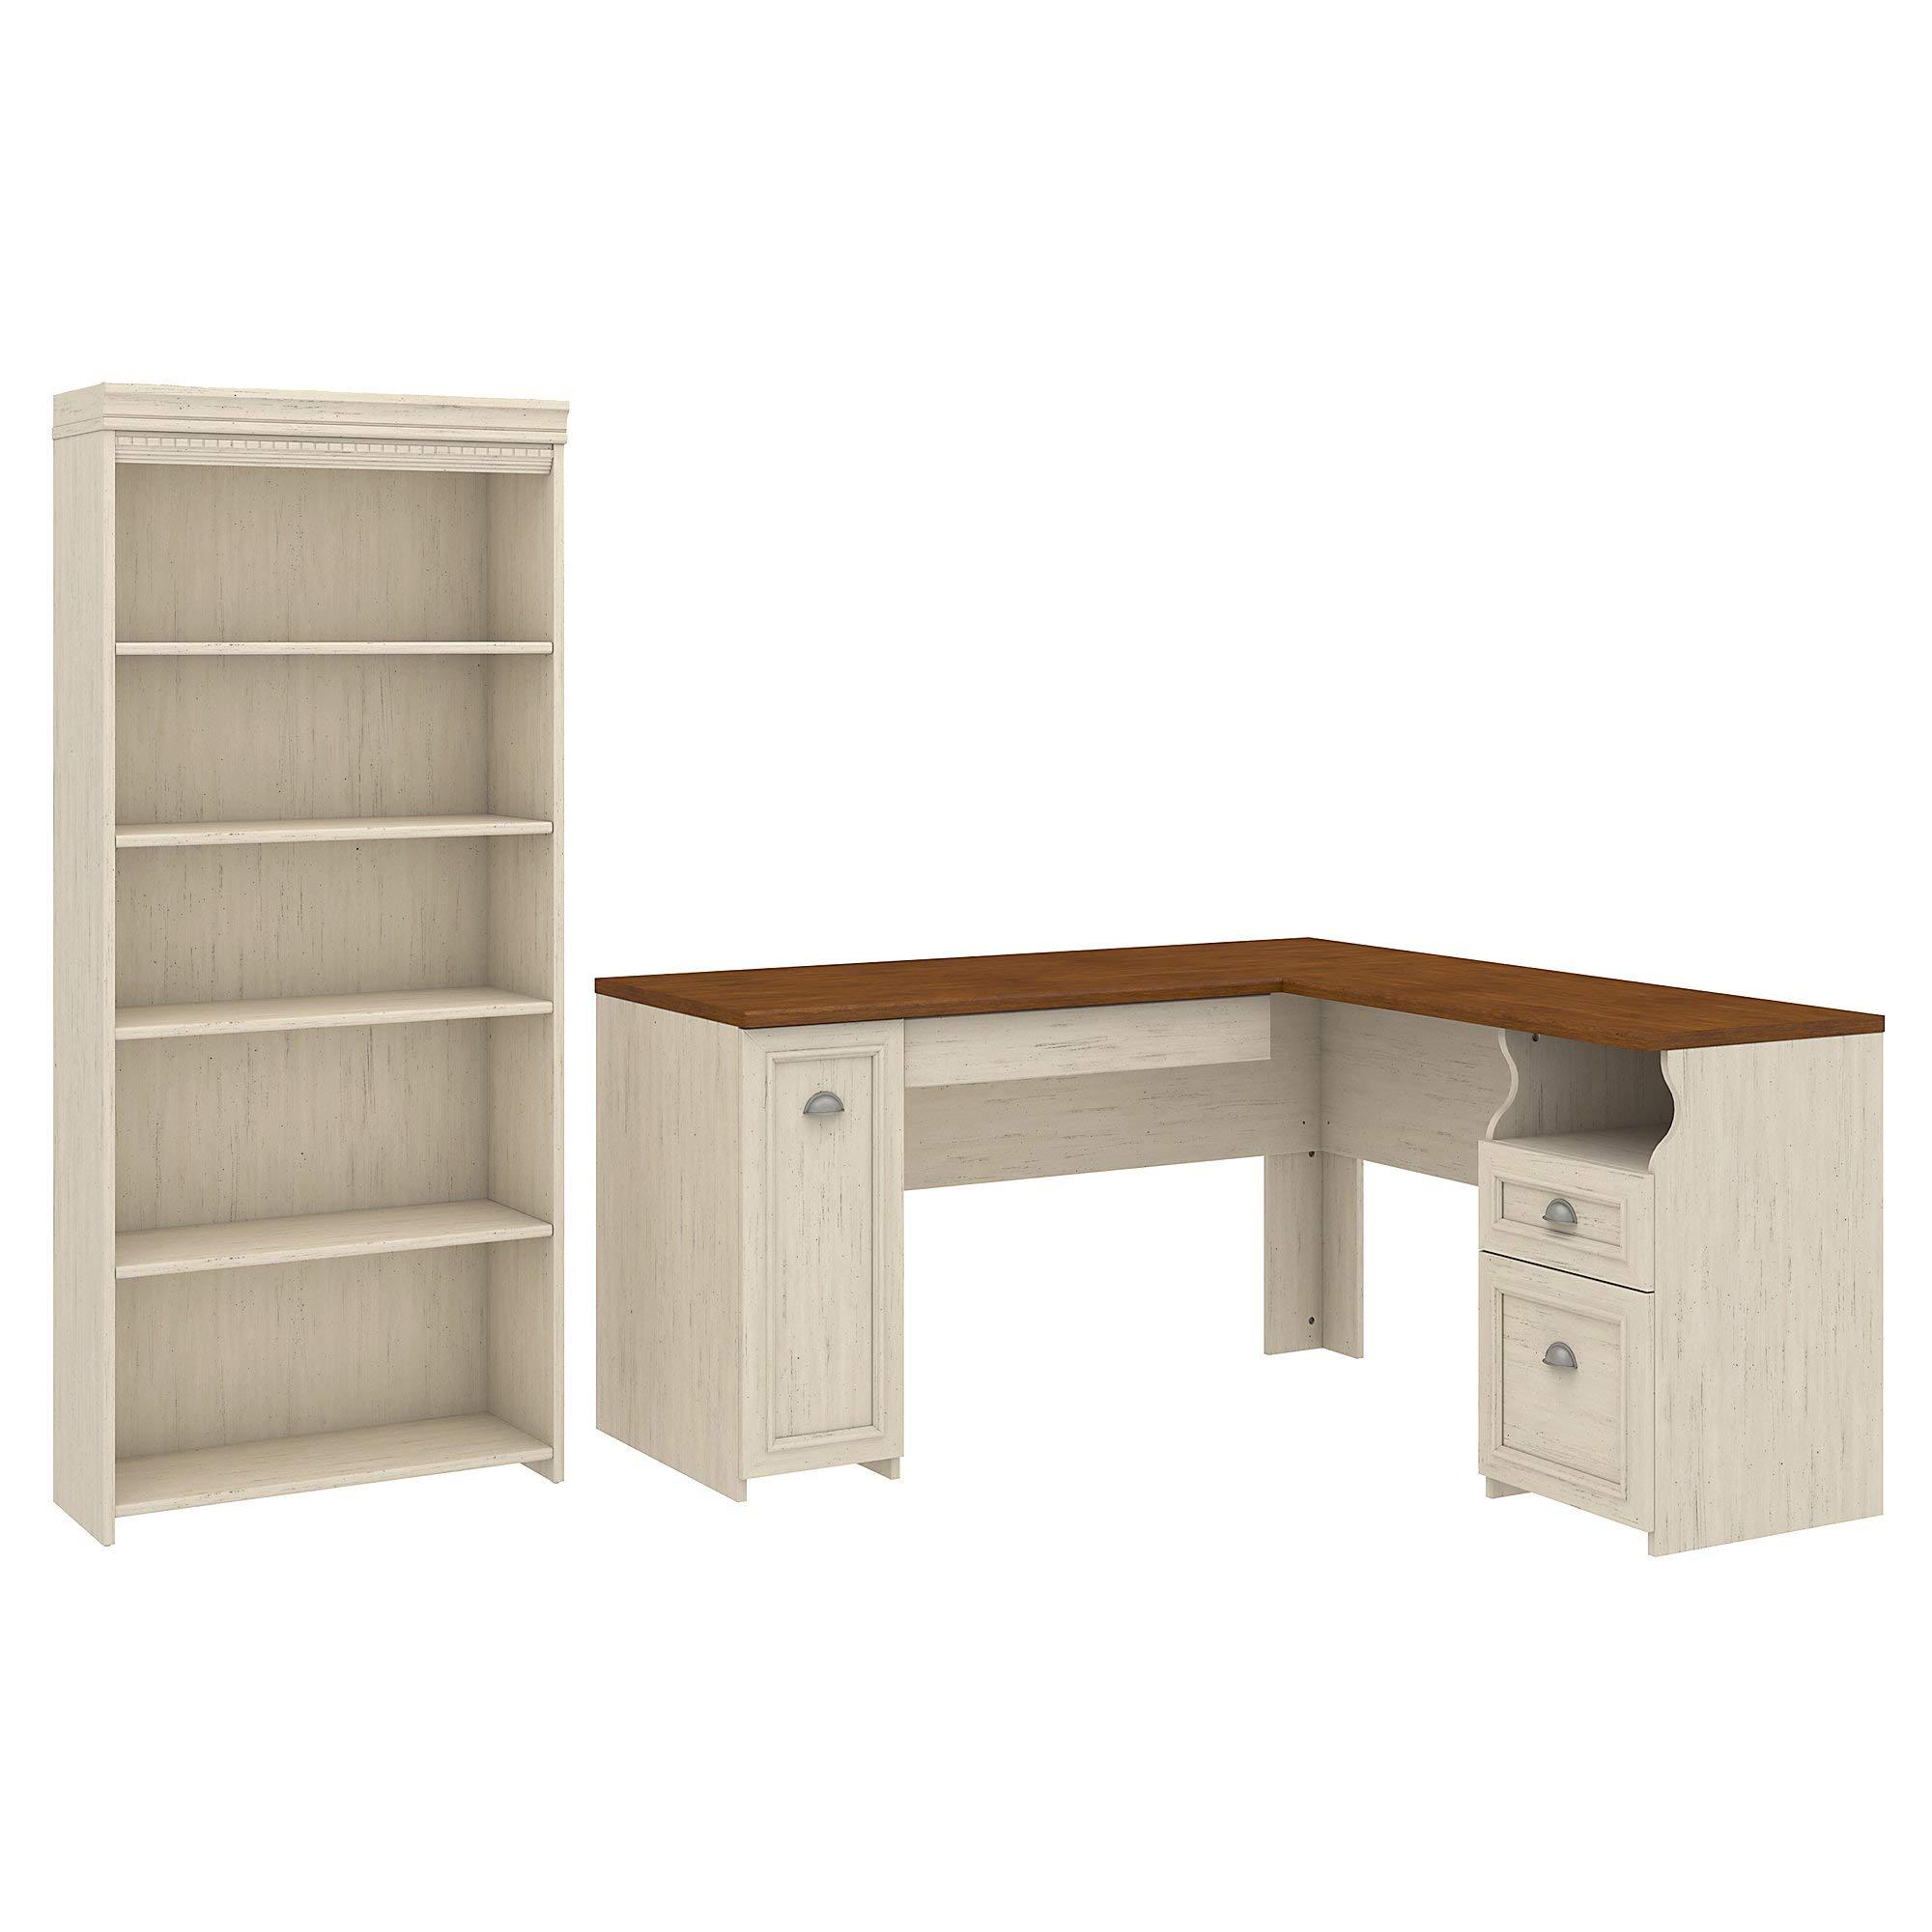 Bush Furniture Fairview L Shaped Desk and 5 Shelf Bookcase in Antique White